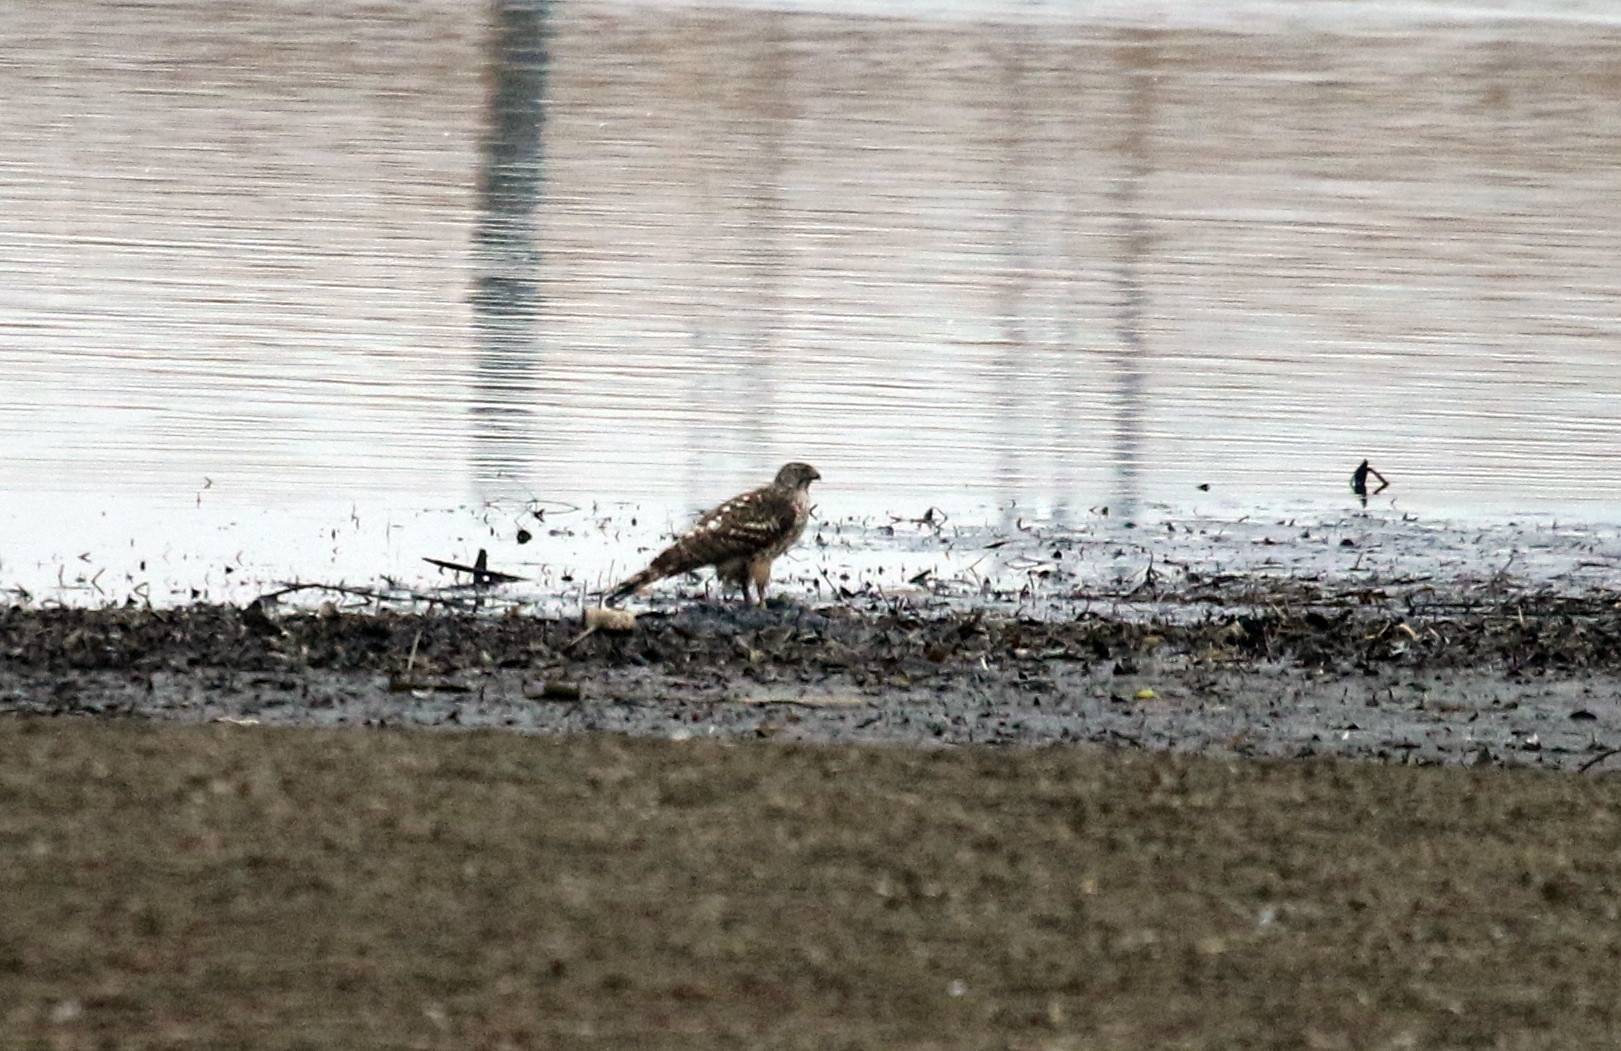 MFの沼は猛禽デーでした_f0239515_1713770.jpg